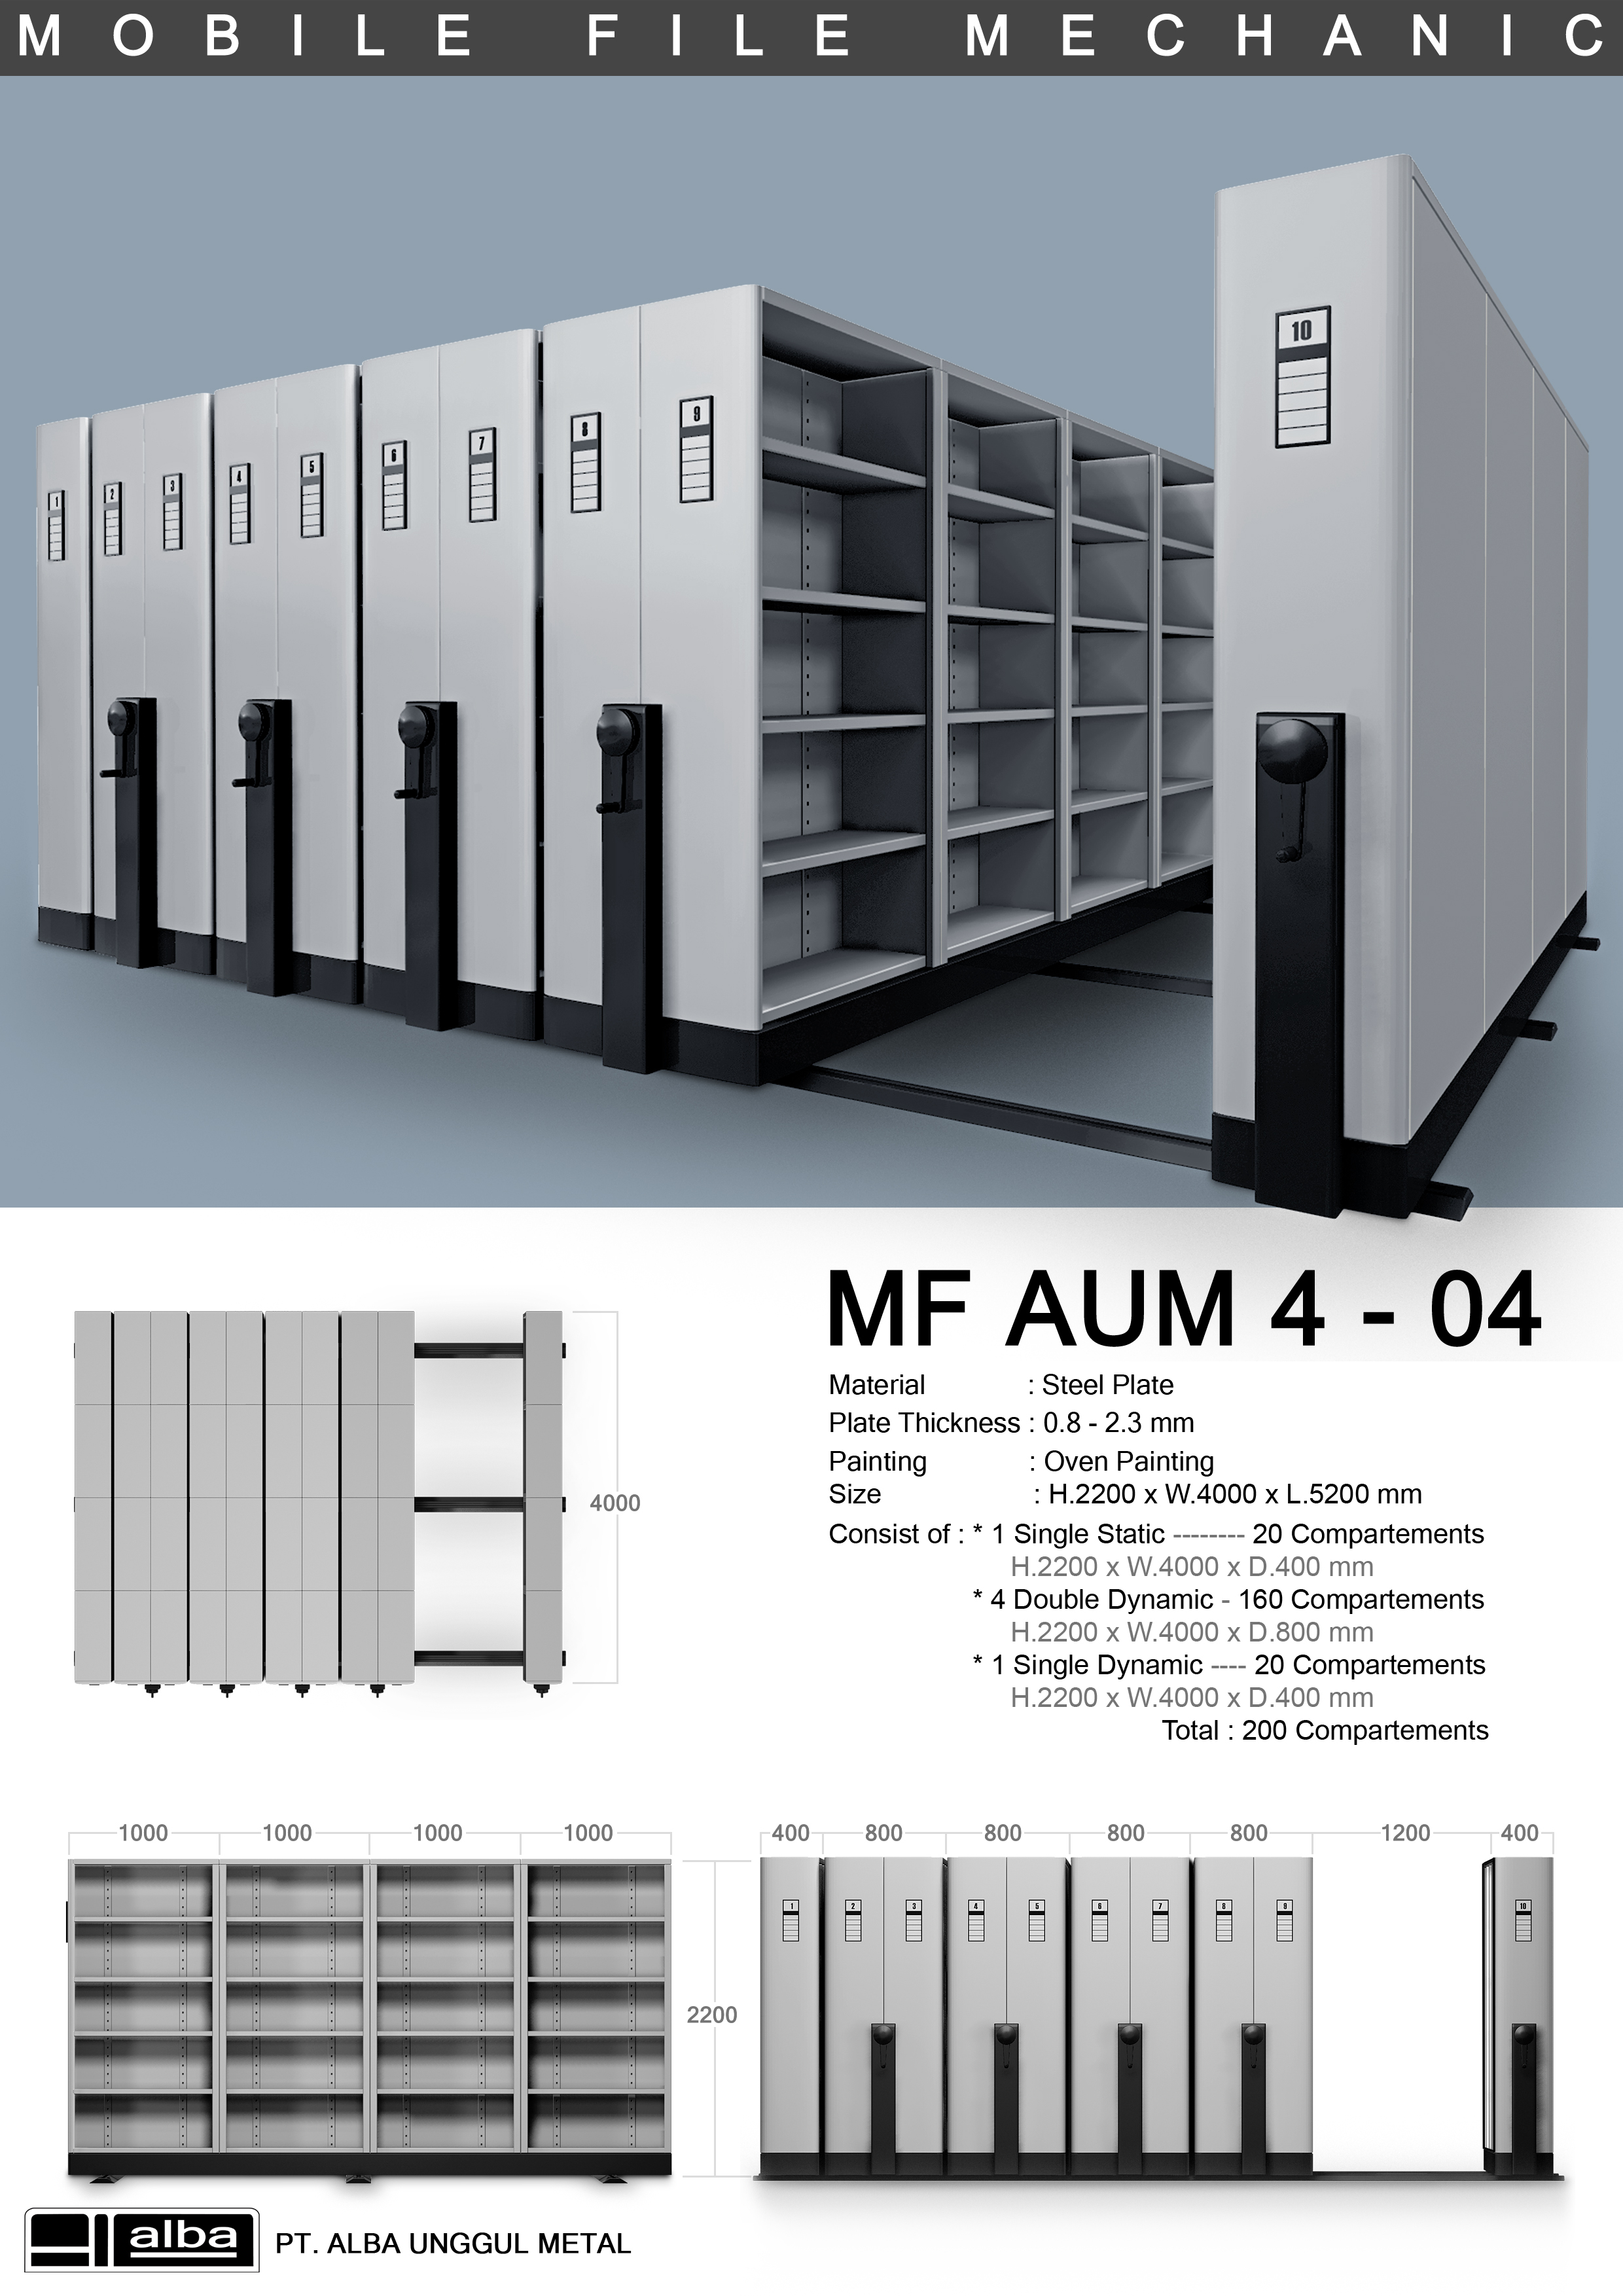 Mobile File Mekanik Alba 4-04 B